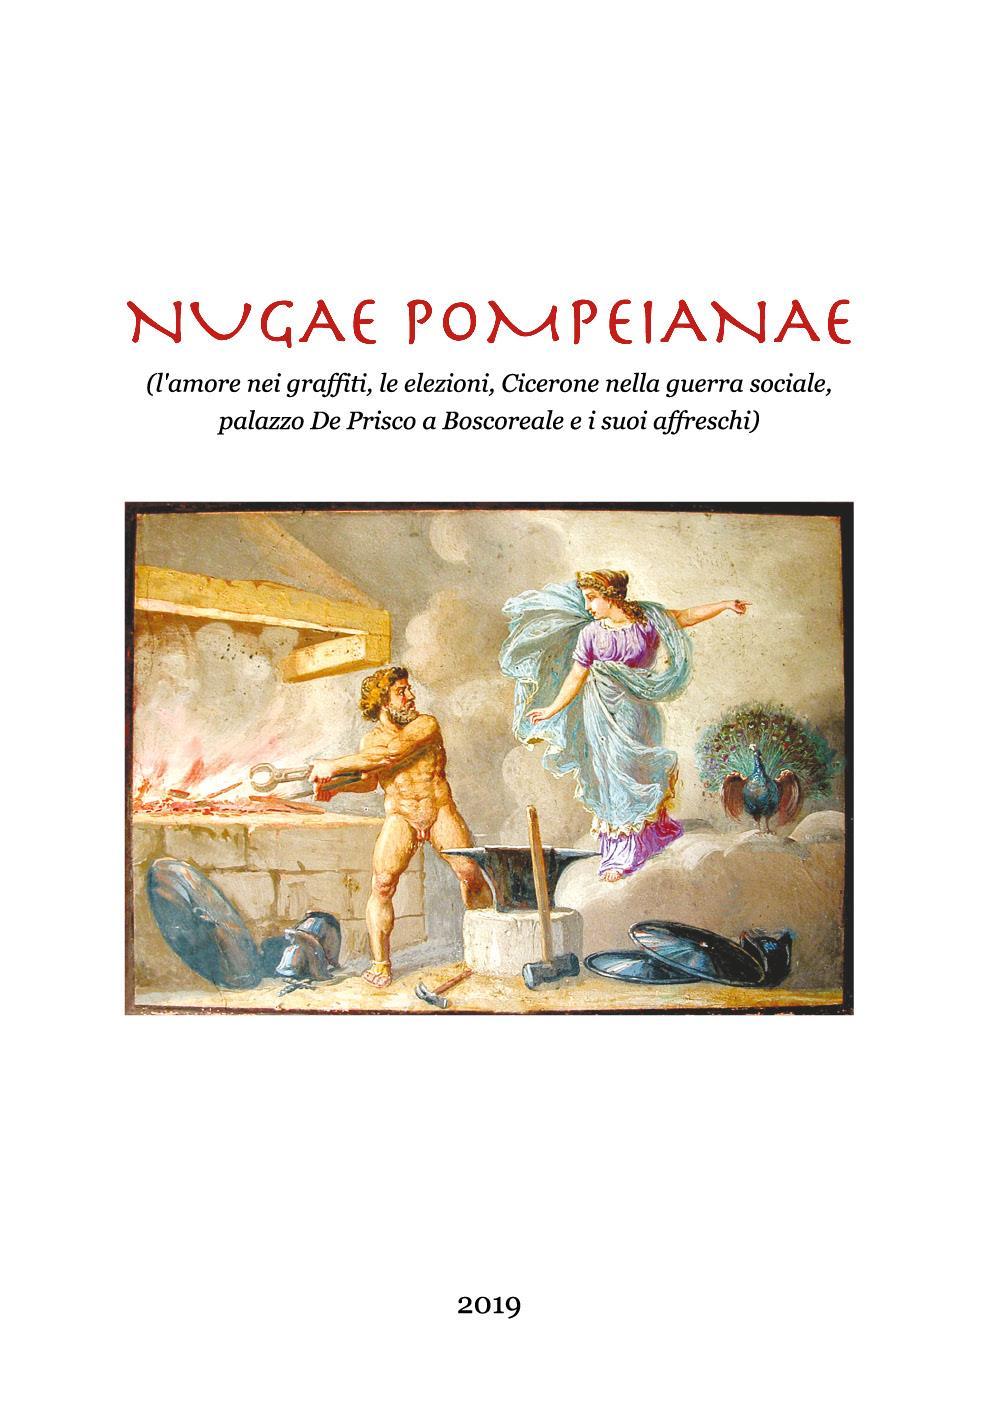 Nugae pompeianae